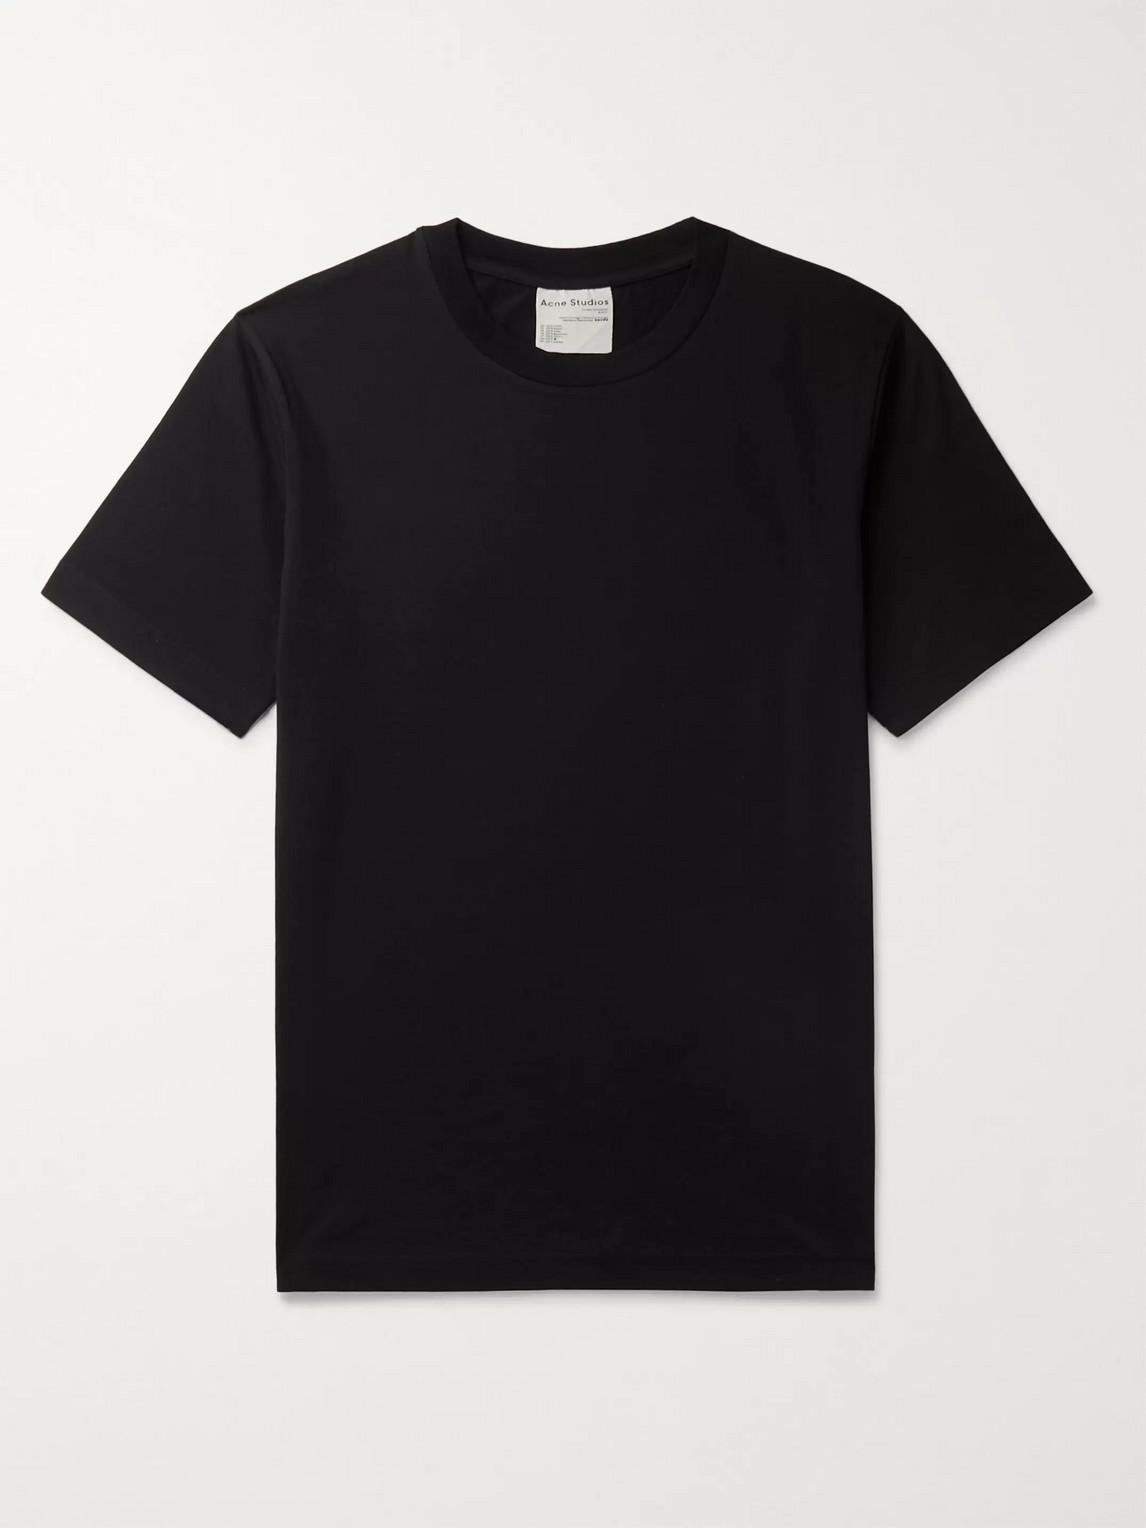 acne studios - slim-fit organic cotton-jersey t-shirt - men - black